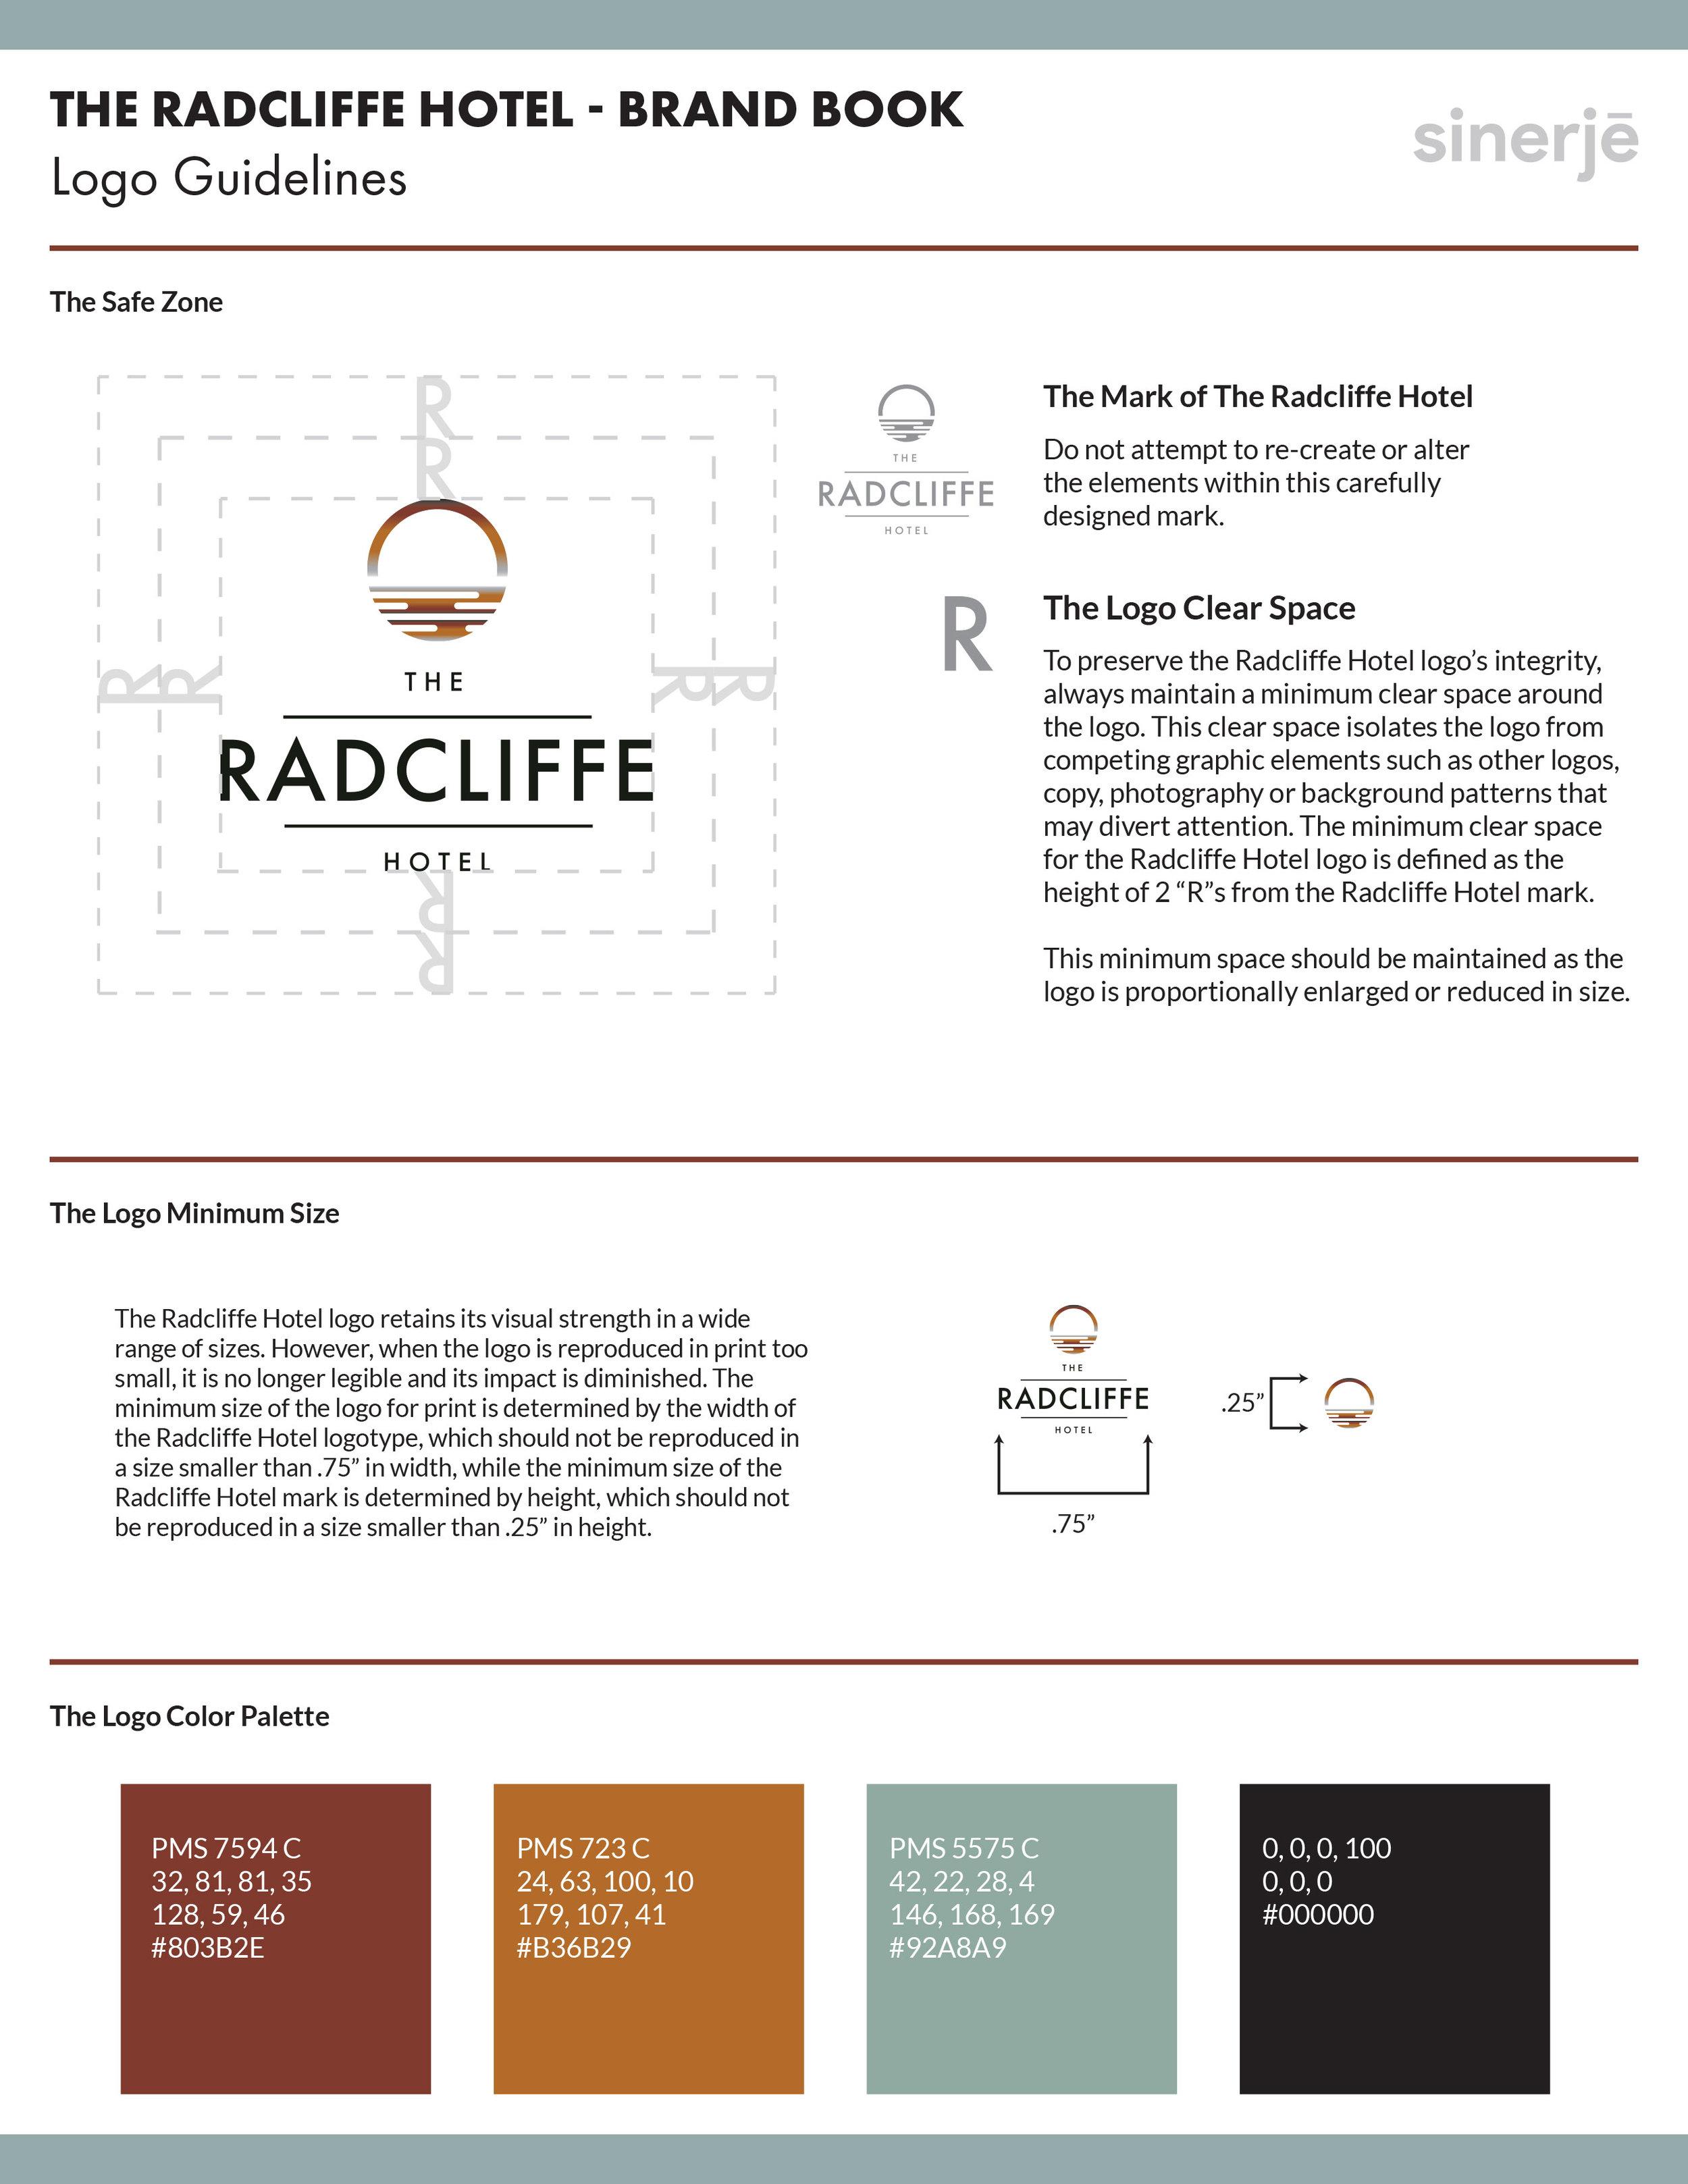 Brand Book Guideline 4.jpg